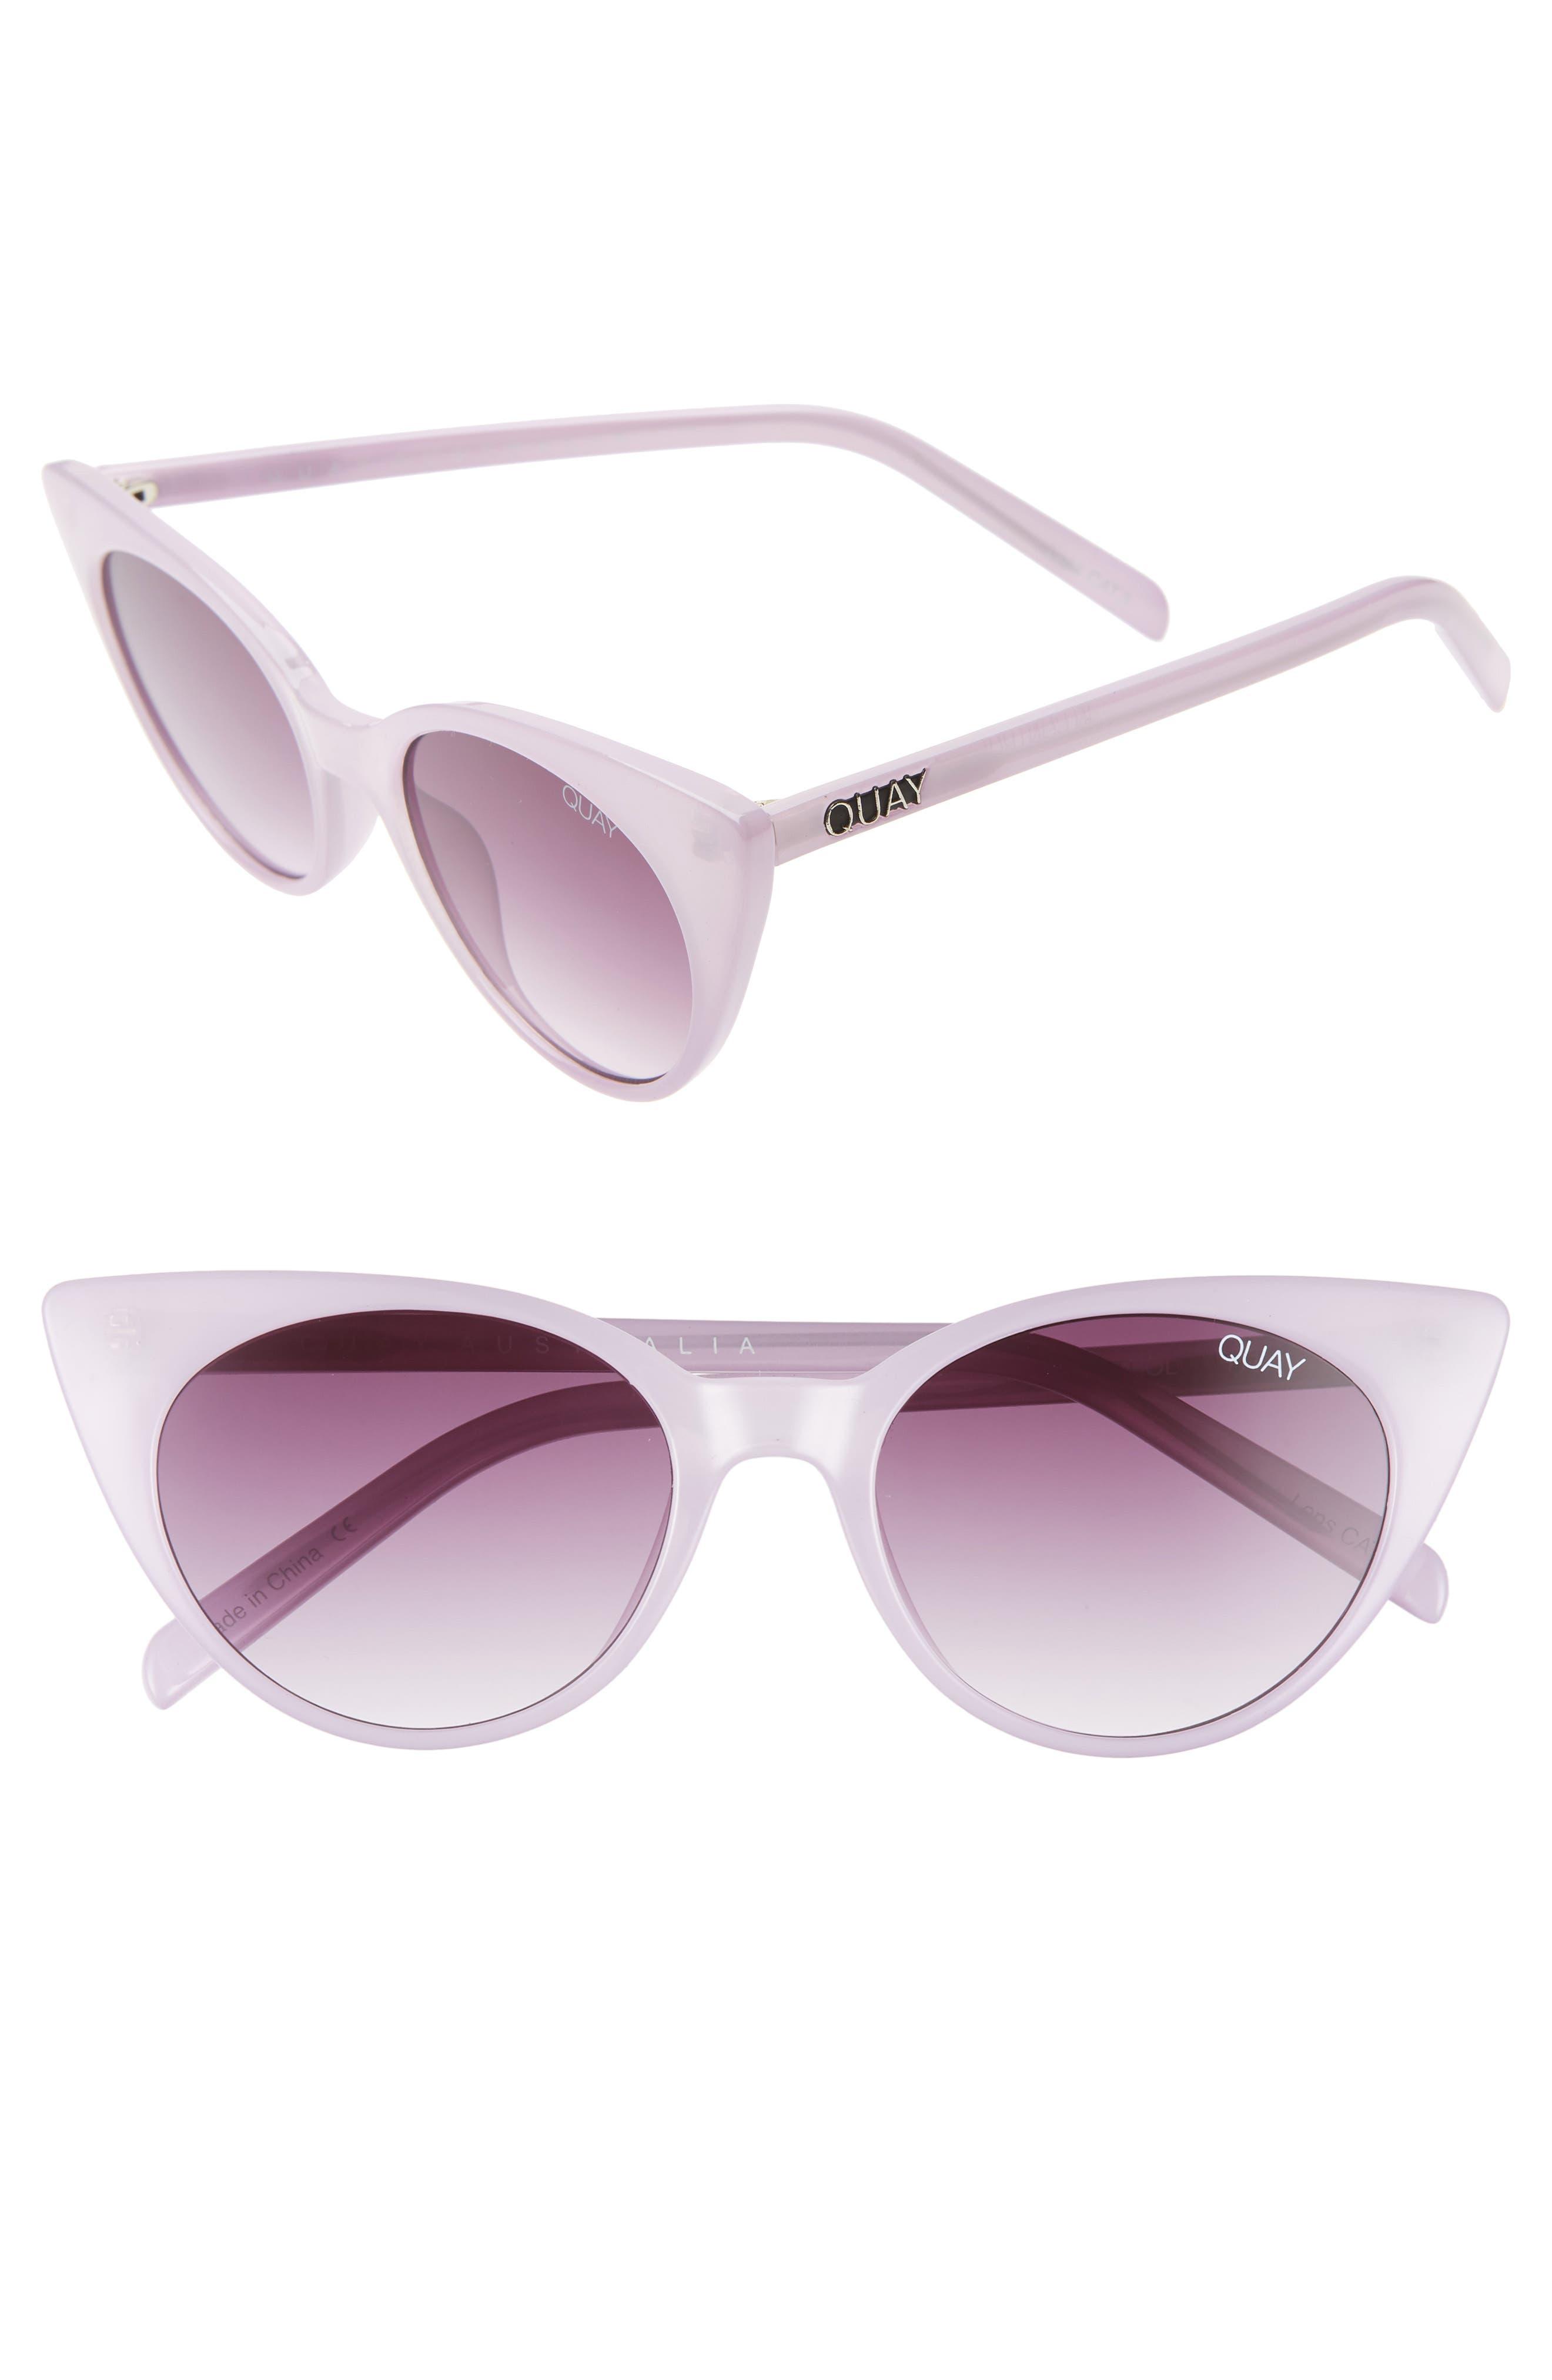 Quay Australia Aphrodite 5m Cat Eye Sunglasses - Violet/ Purple Fade